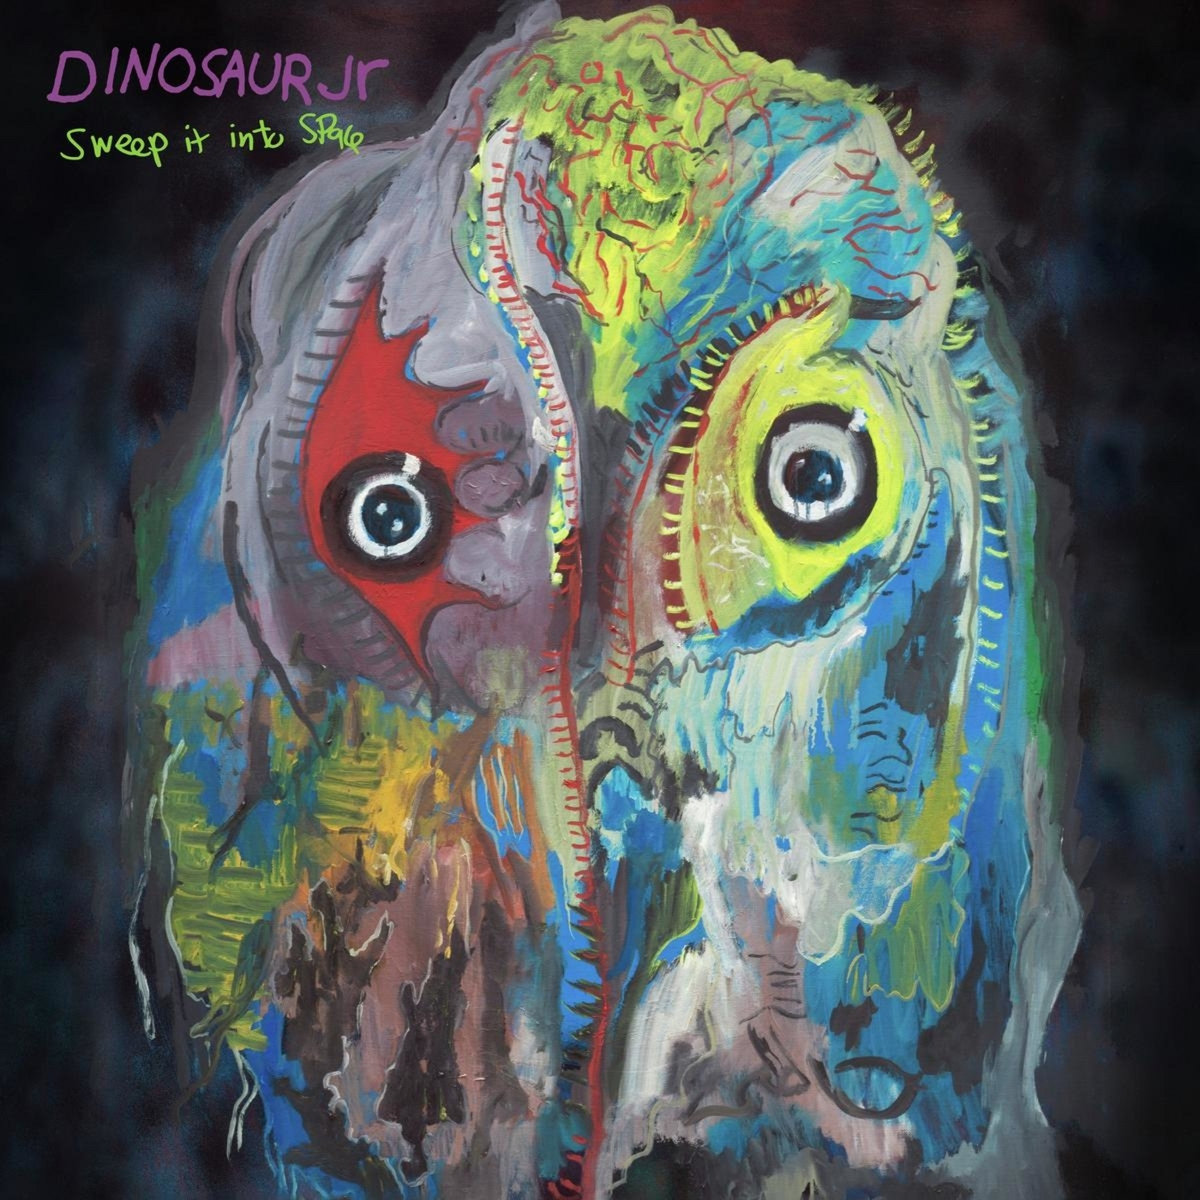 News – Dinosaur Jr – Sweep It Into Space